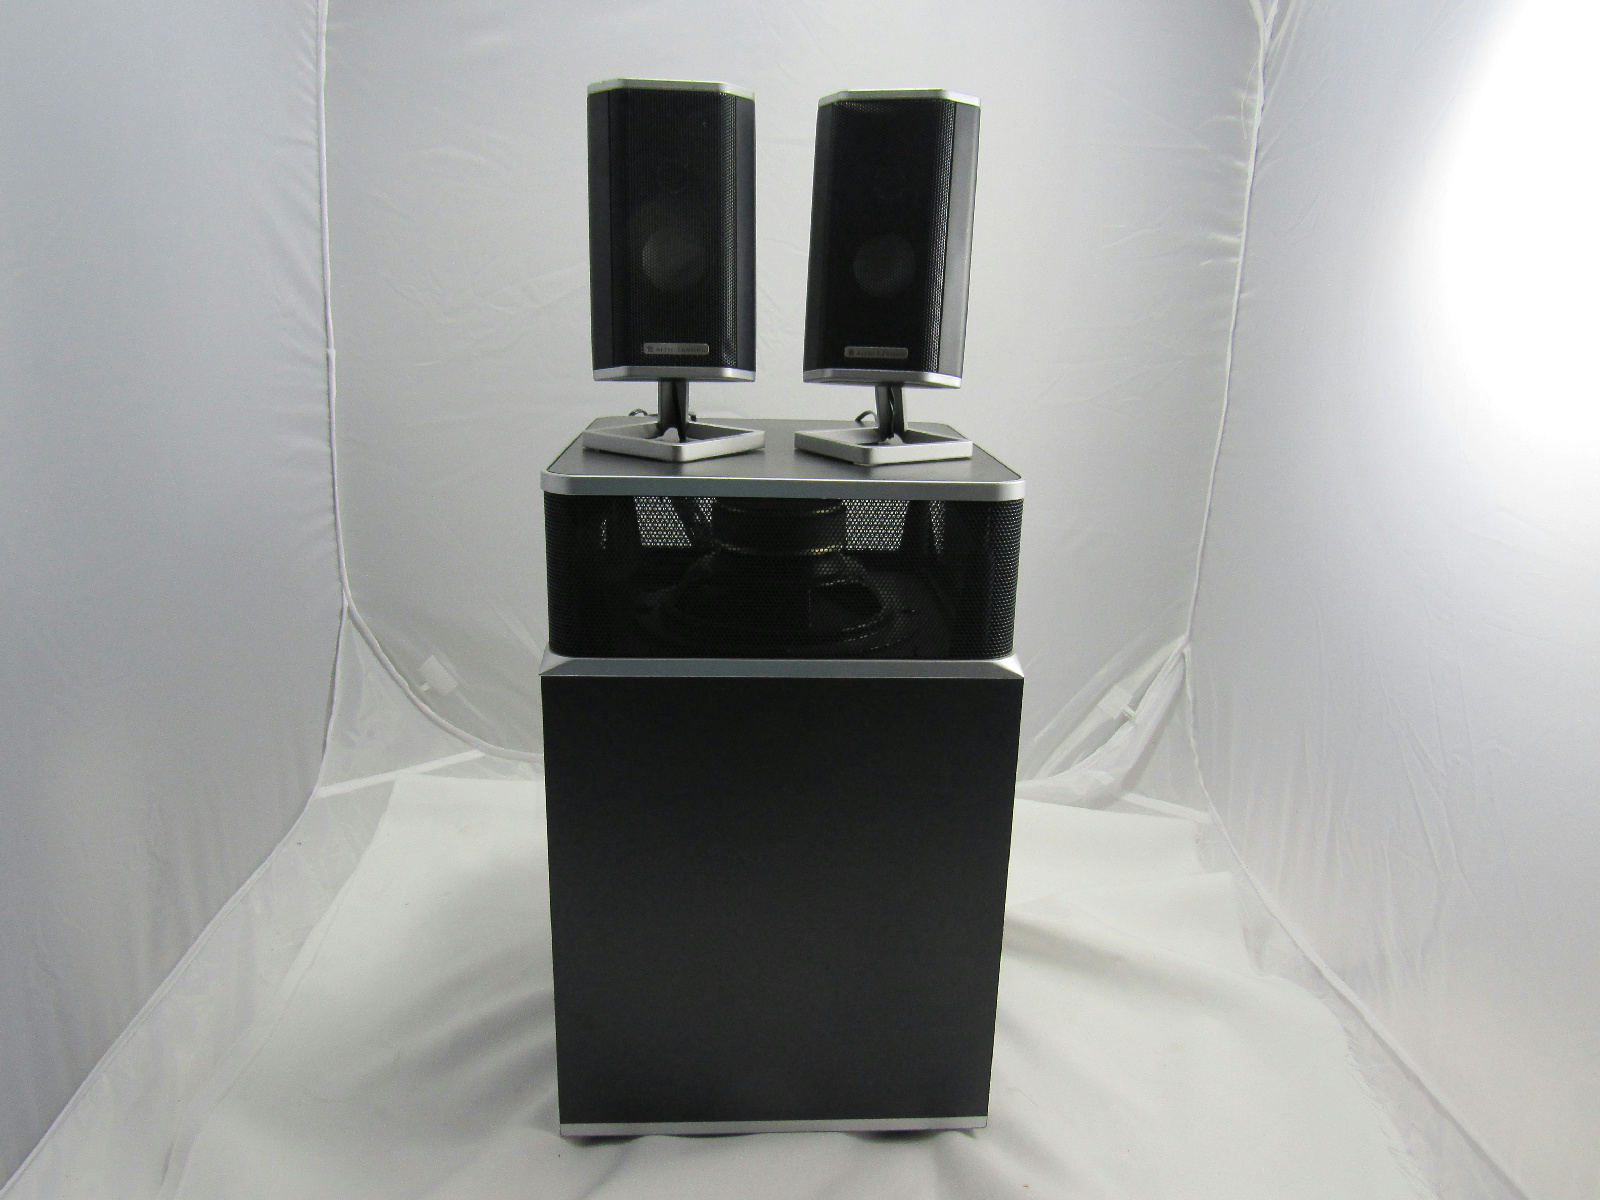 altec lansing x4021 amplified speaker system speakers and sub. Black Bedroom Furniture Sets. Home Design Ideas